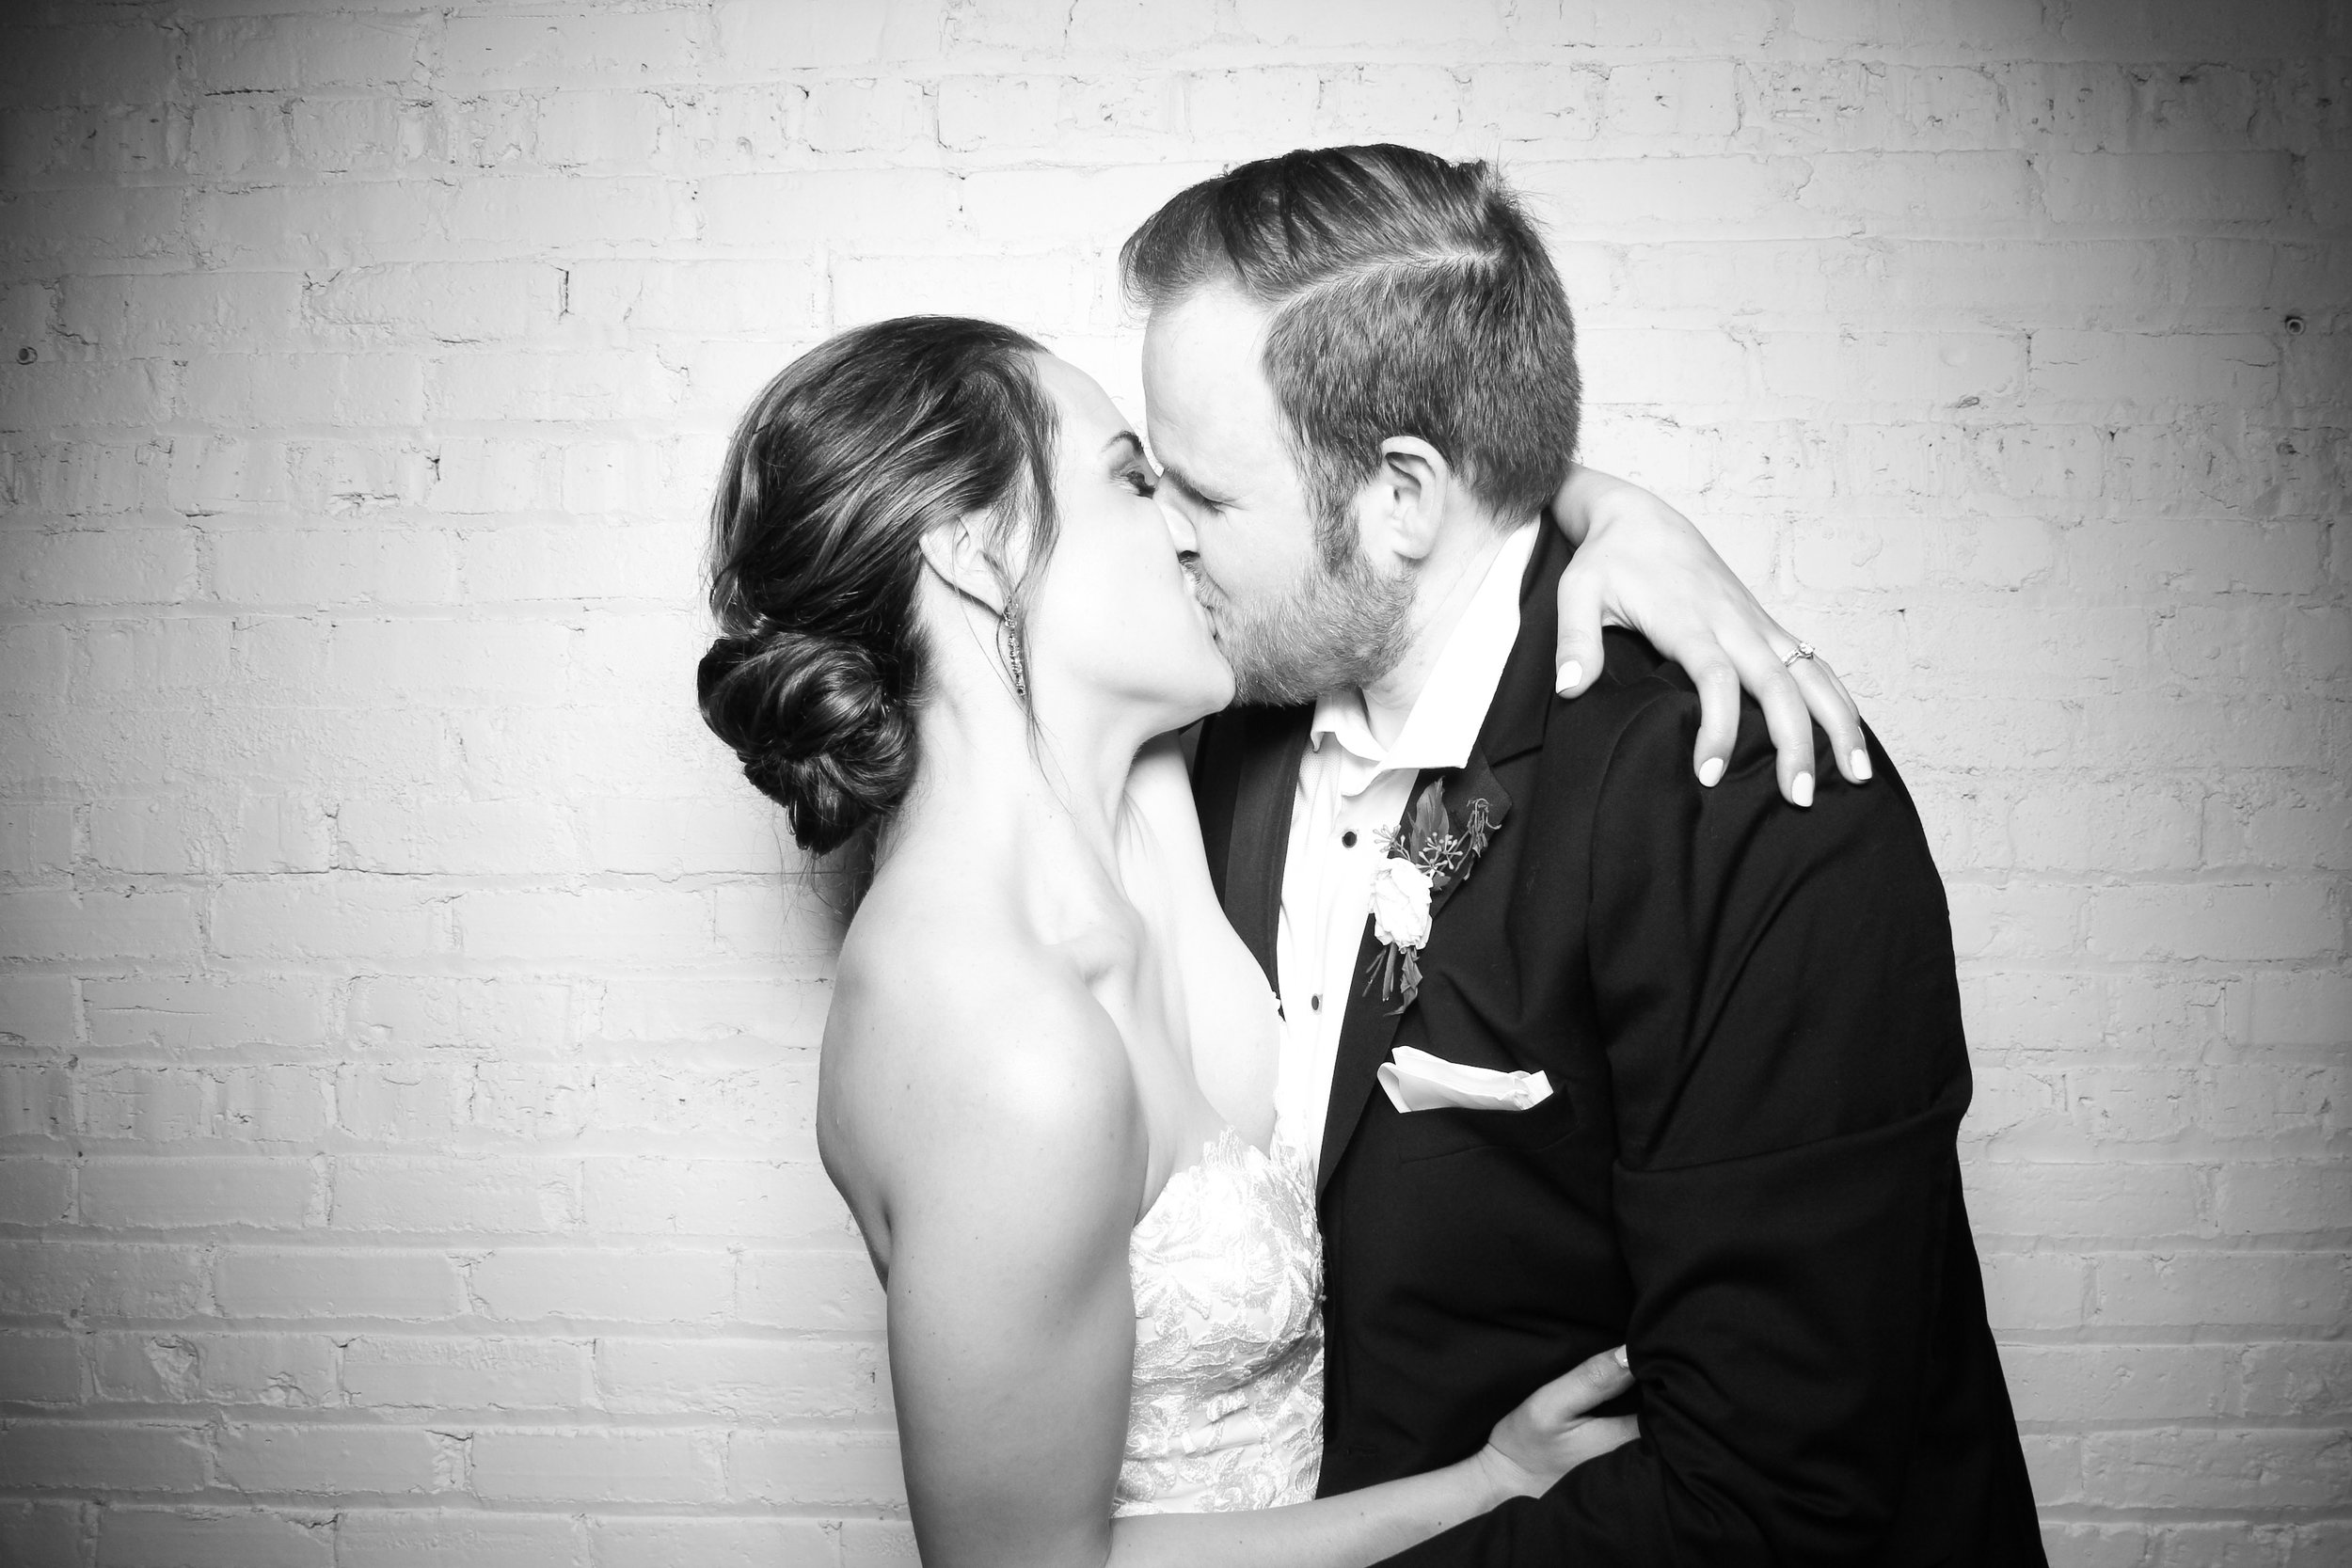 Chicago_Vintage_Wedding_Photobooth_Company_251_Aurora_19.jpg